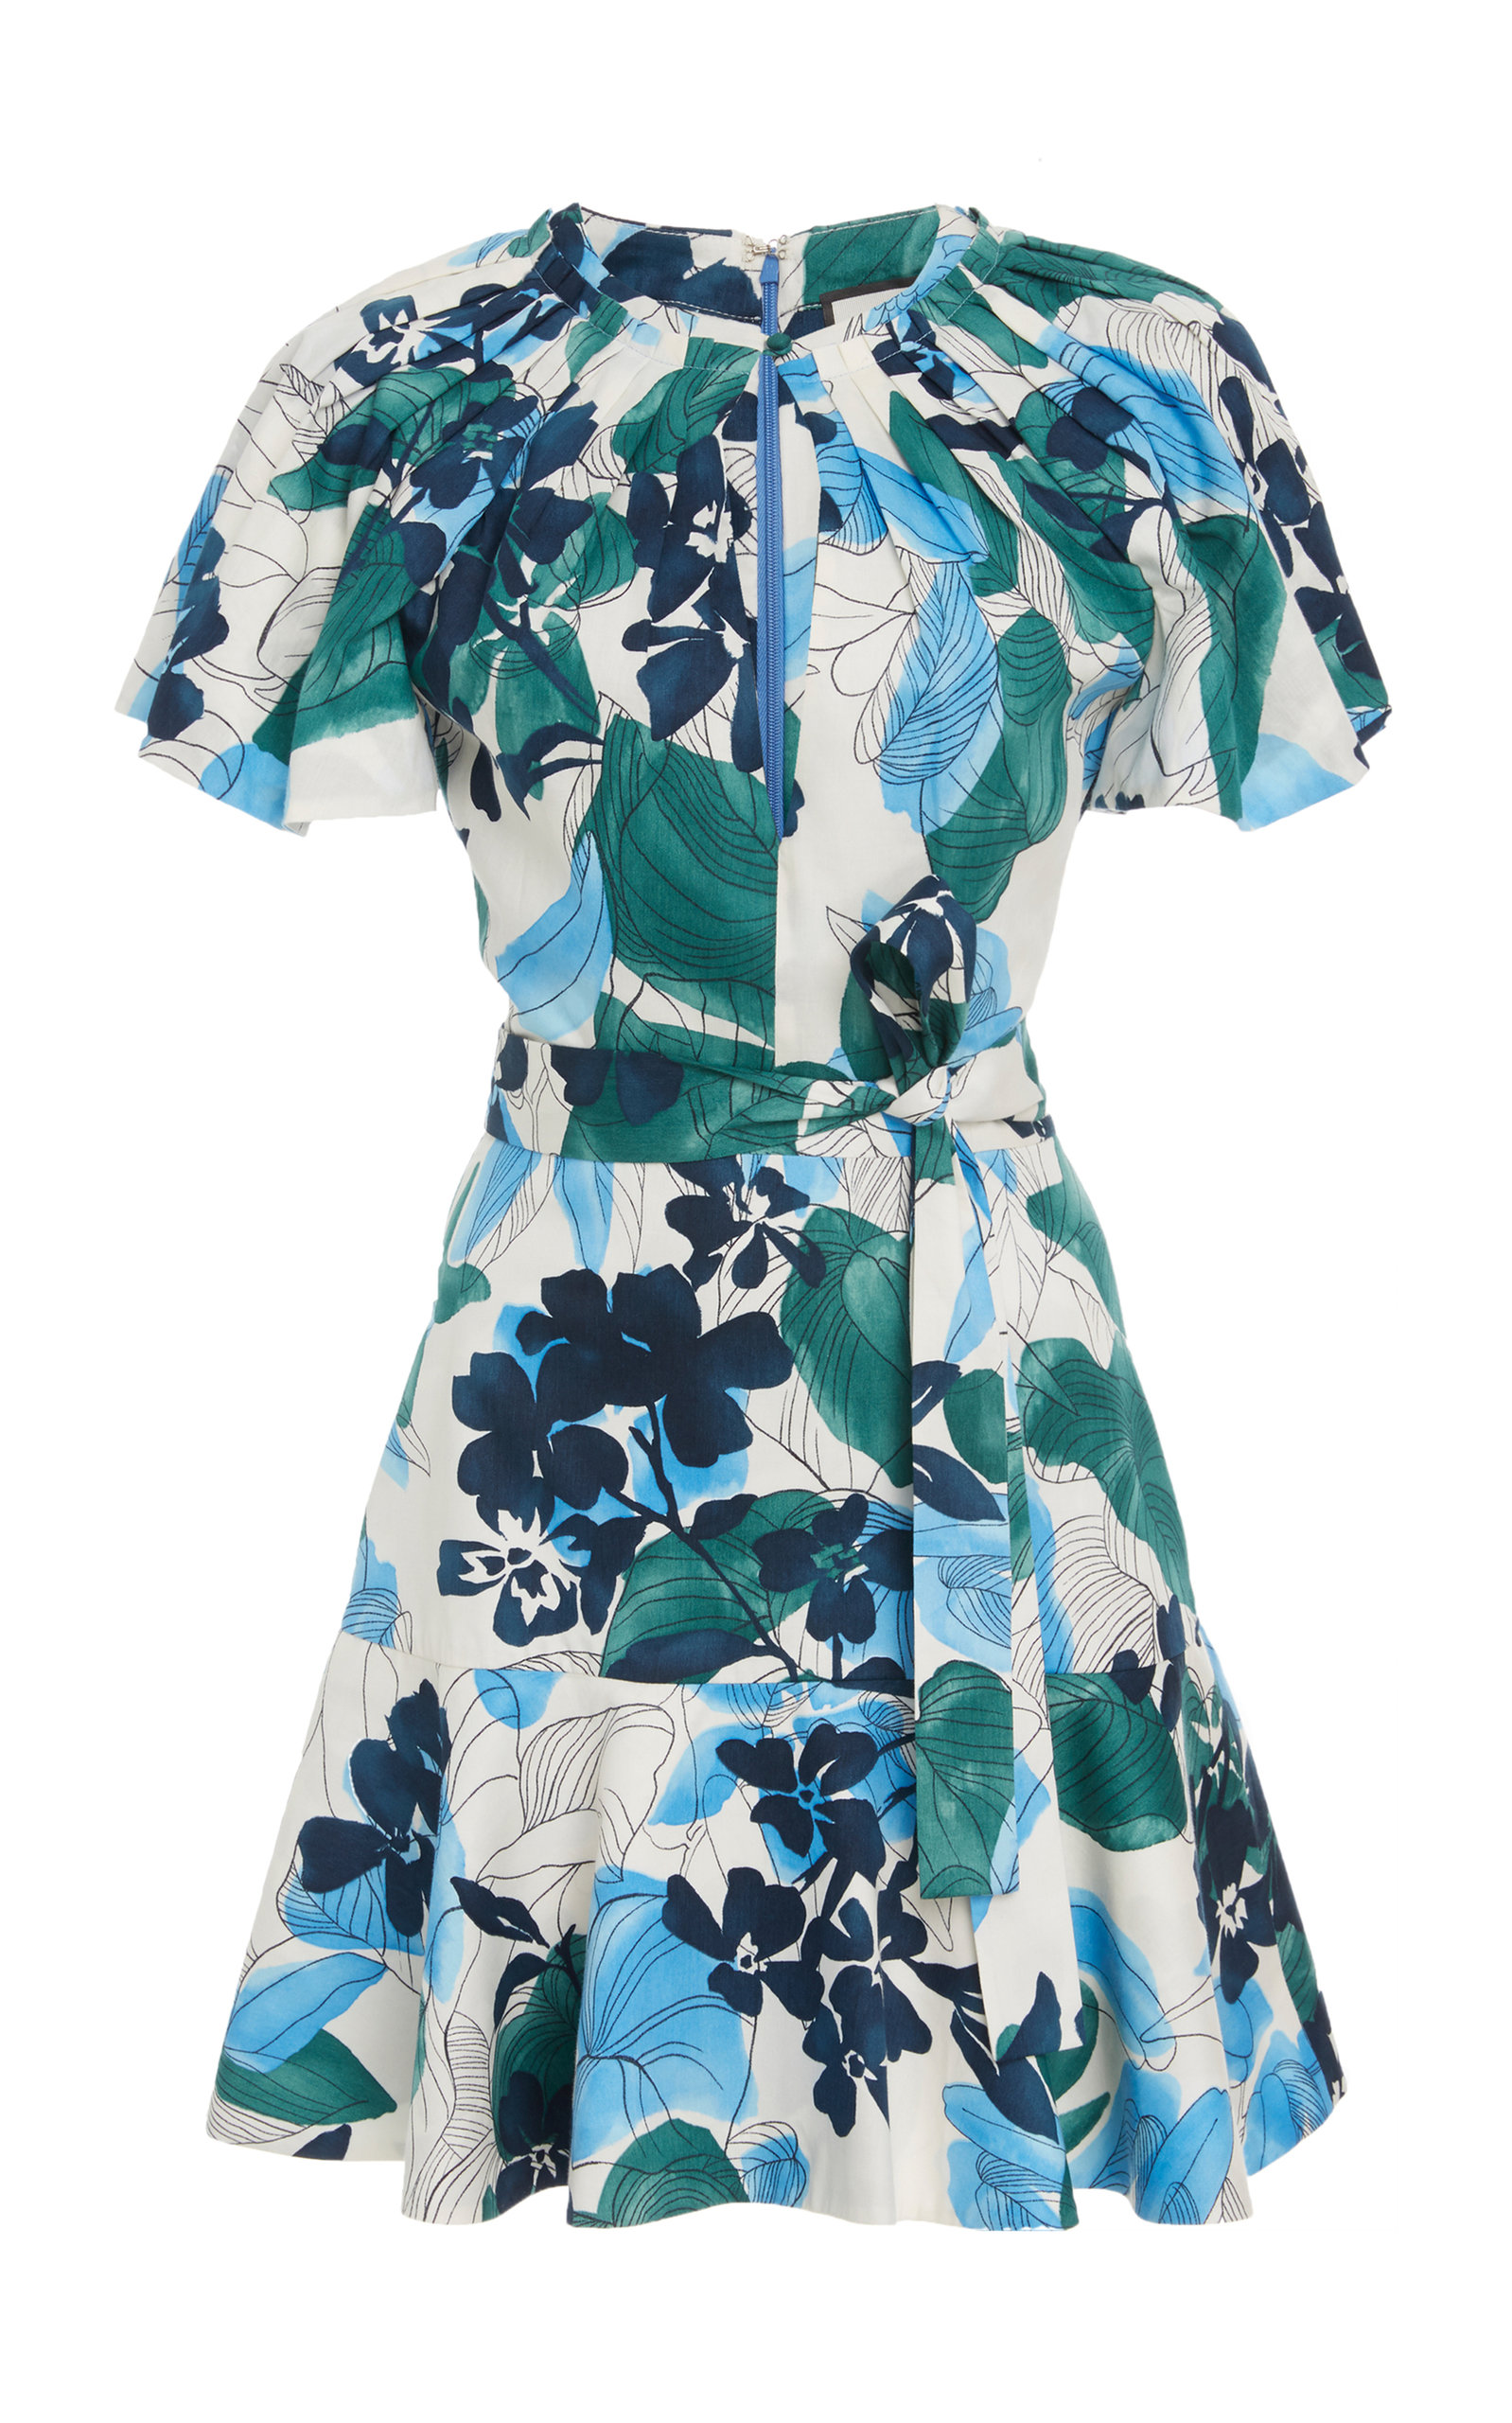 Reede Floral-Print Twist A-Line Dress in Blue Serenity